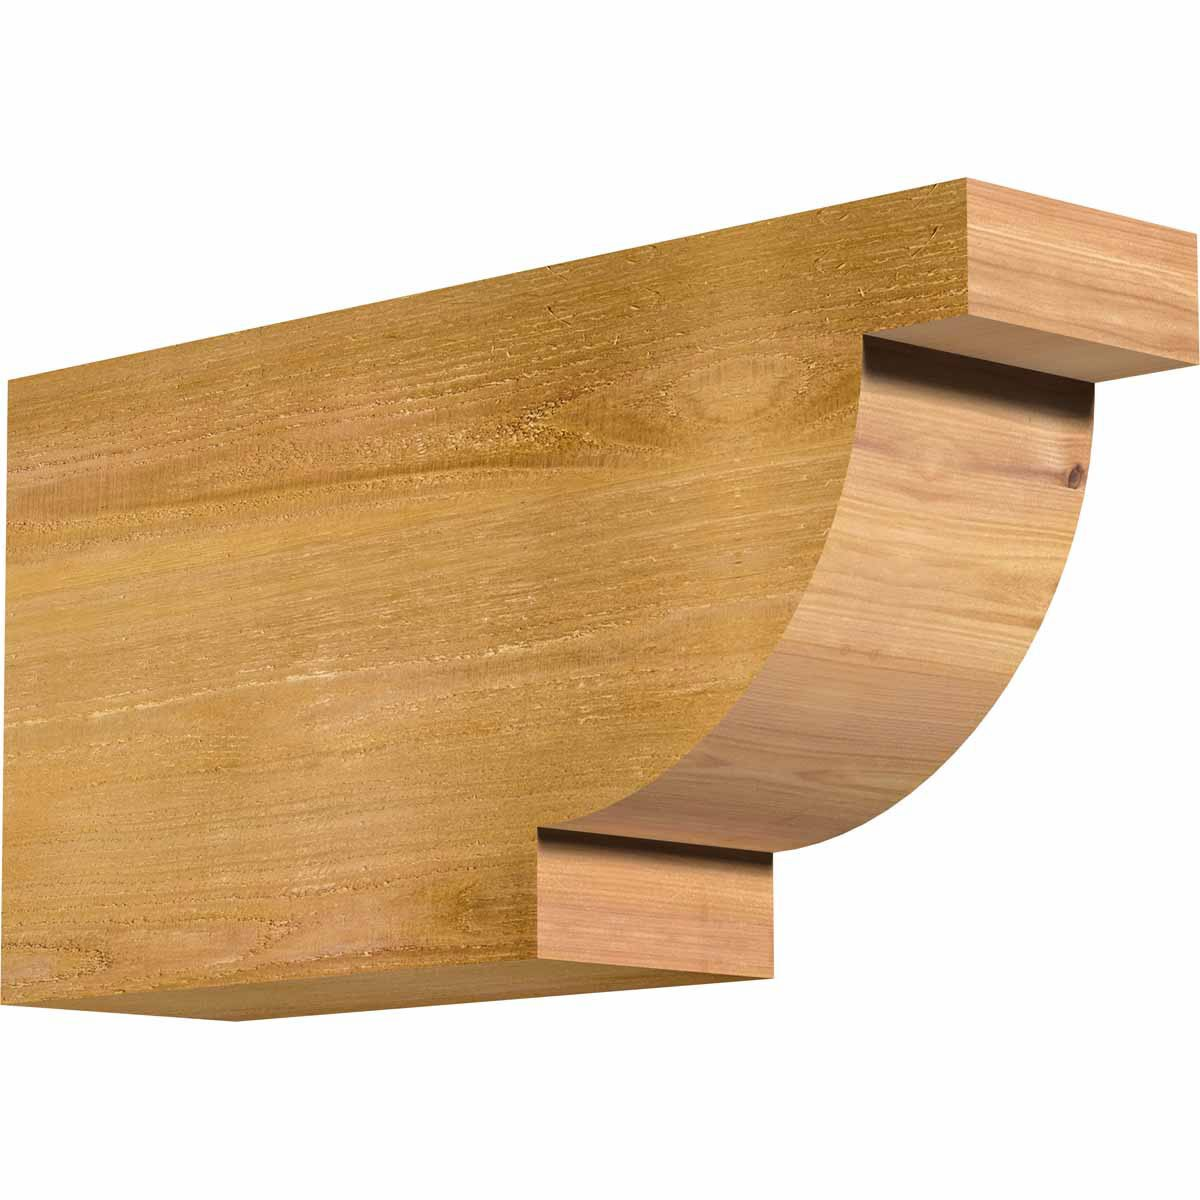 Ekena Millwork RFT06X12X24ALP00RWR Alpine Rough Sawn Rafter Tail, 6'' Width by 12'' Height by 24'' Length, Western Red Cedar